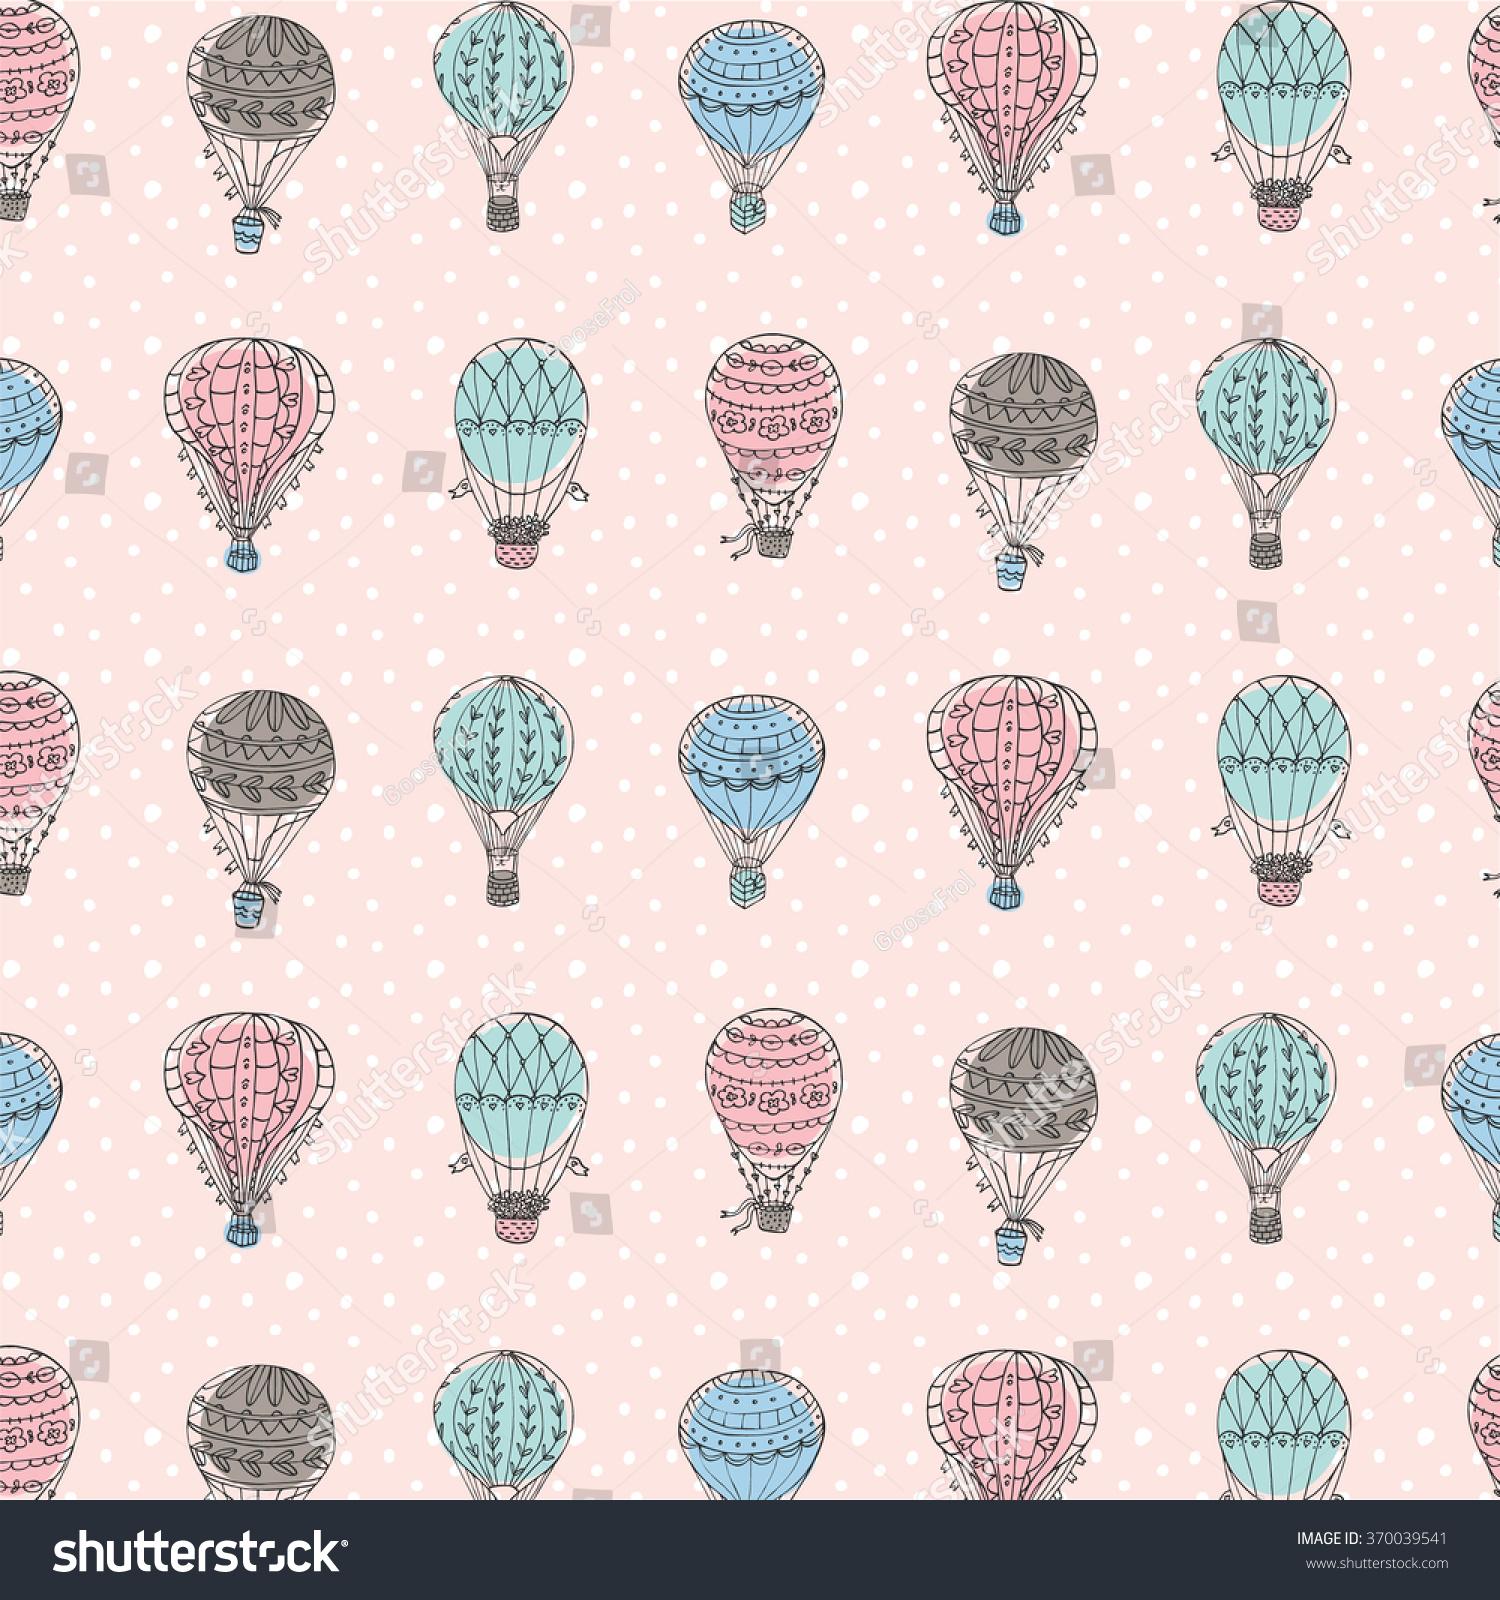 Vintage pastel pattern - photo#25